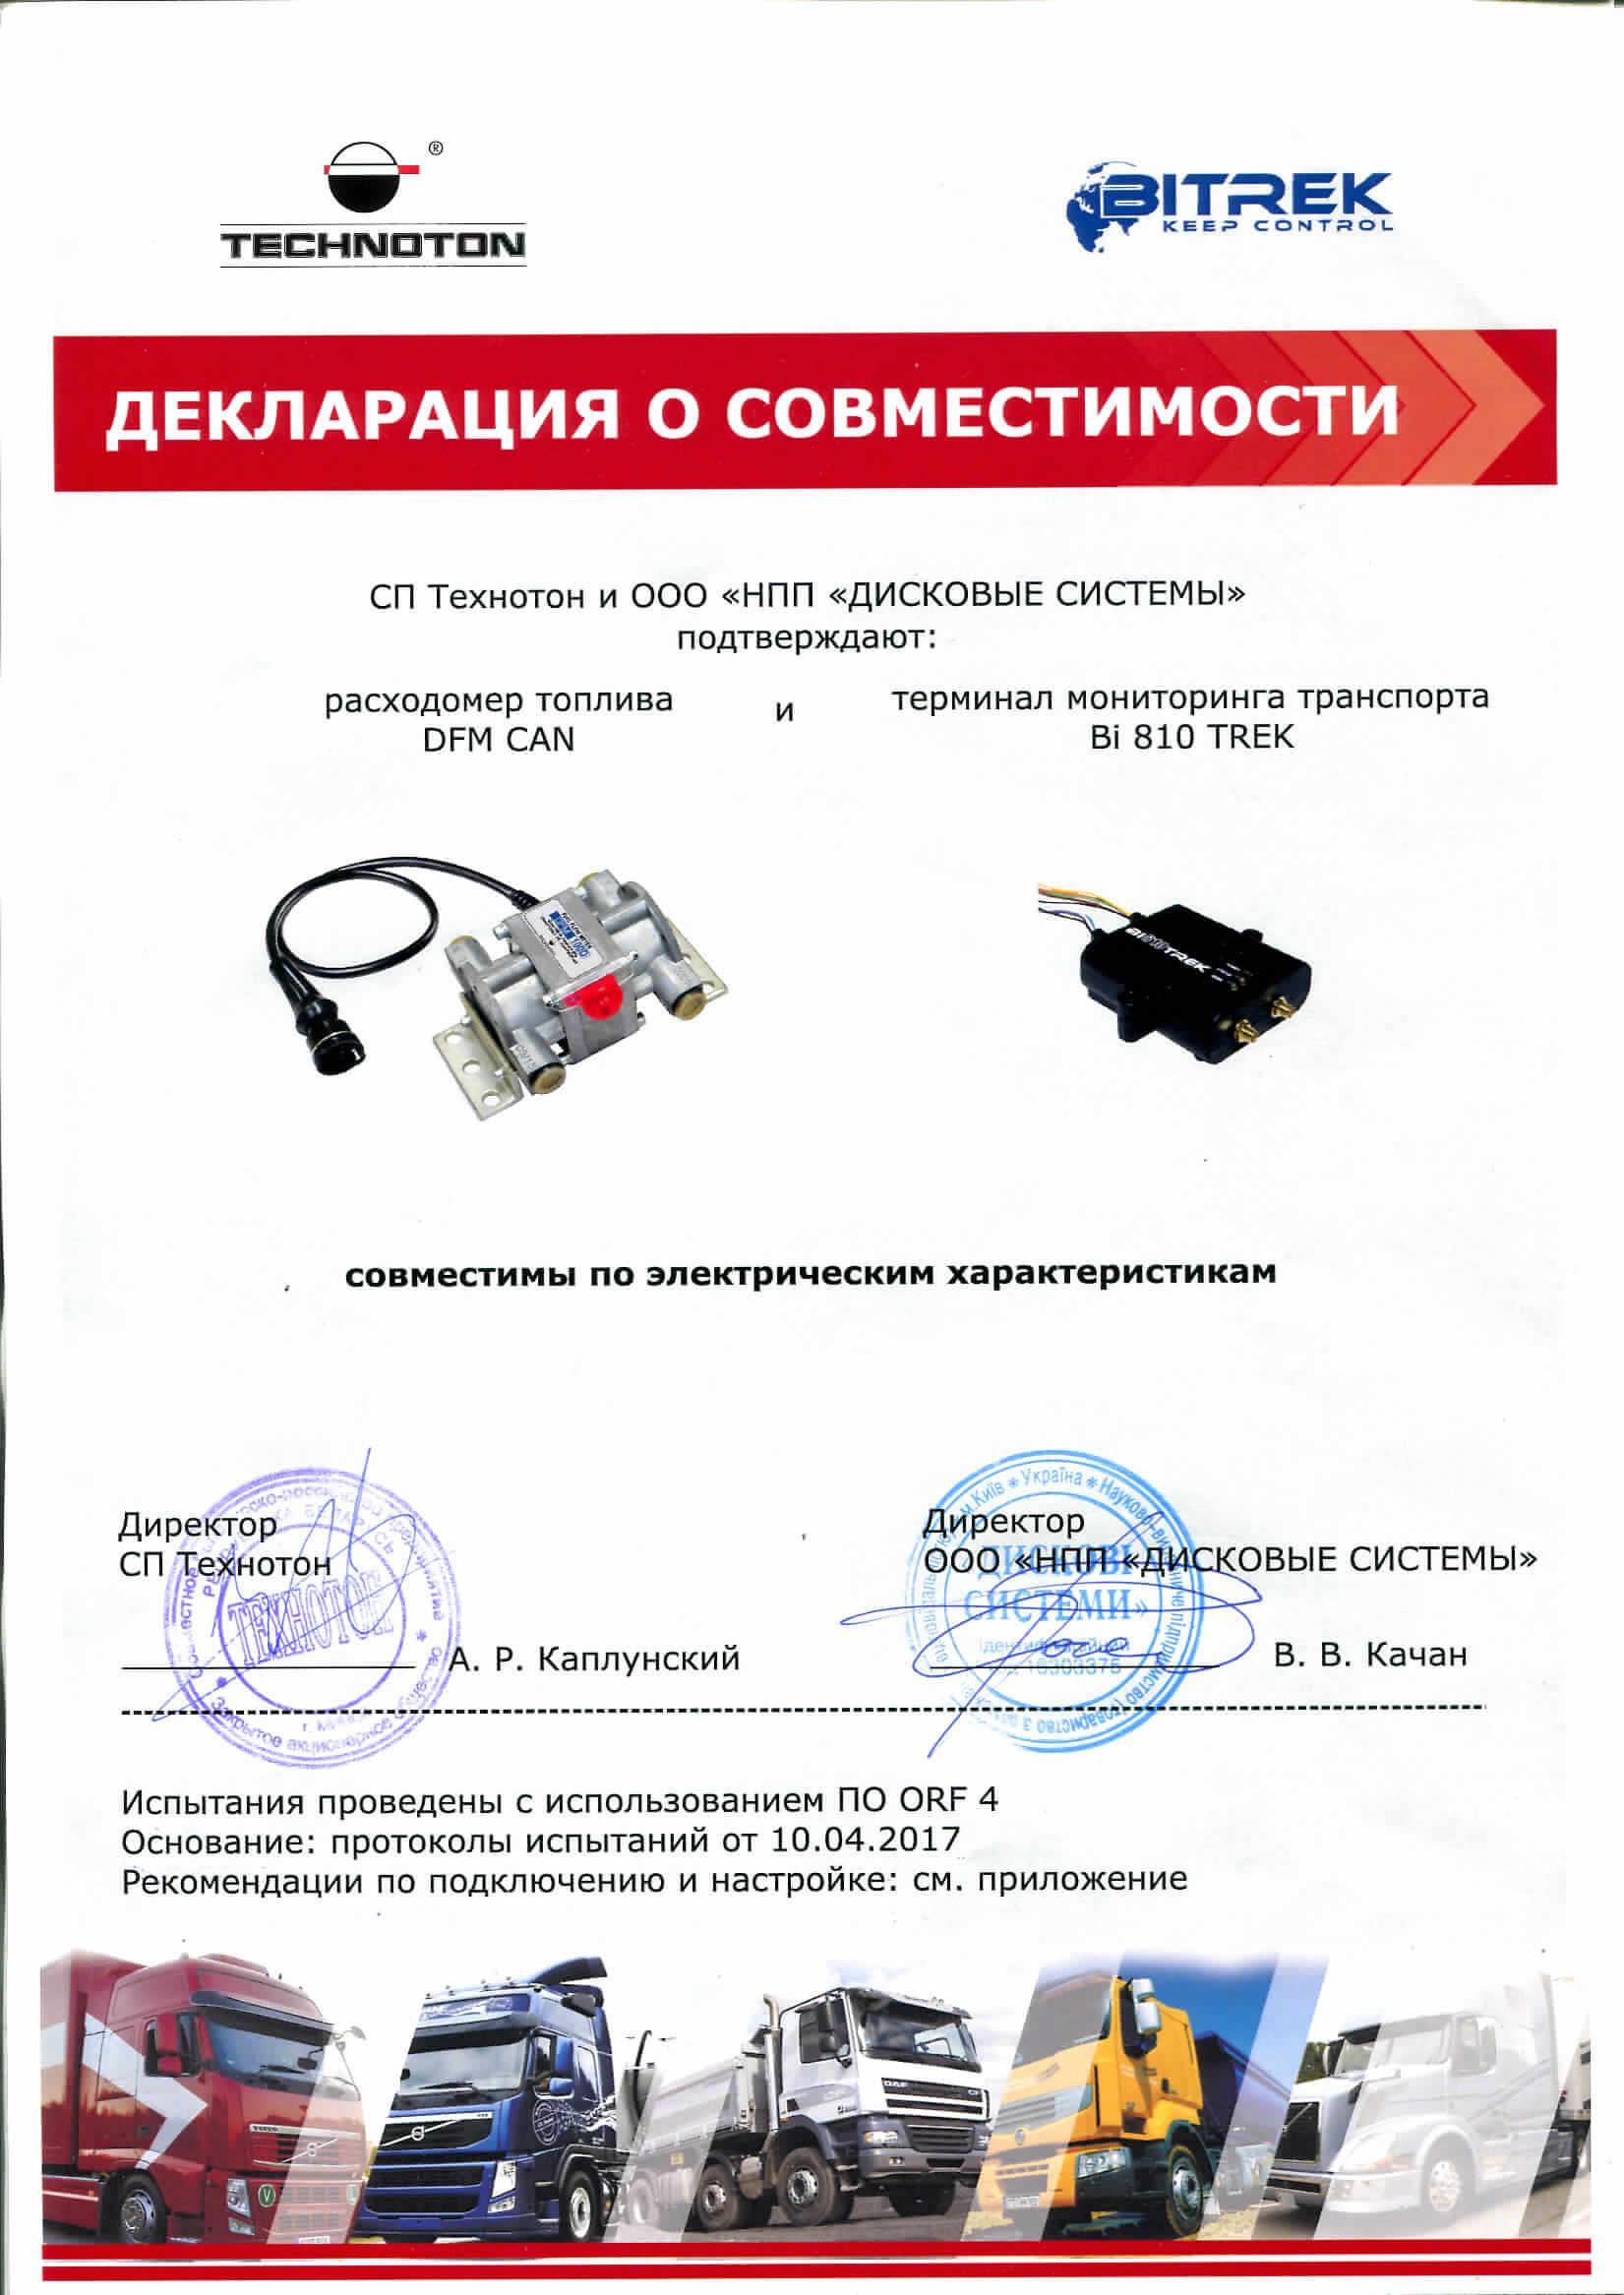 DFM CAN совместим с BITREK BI 810 TREK